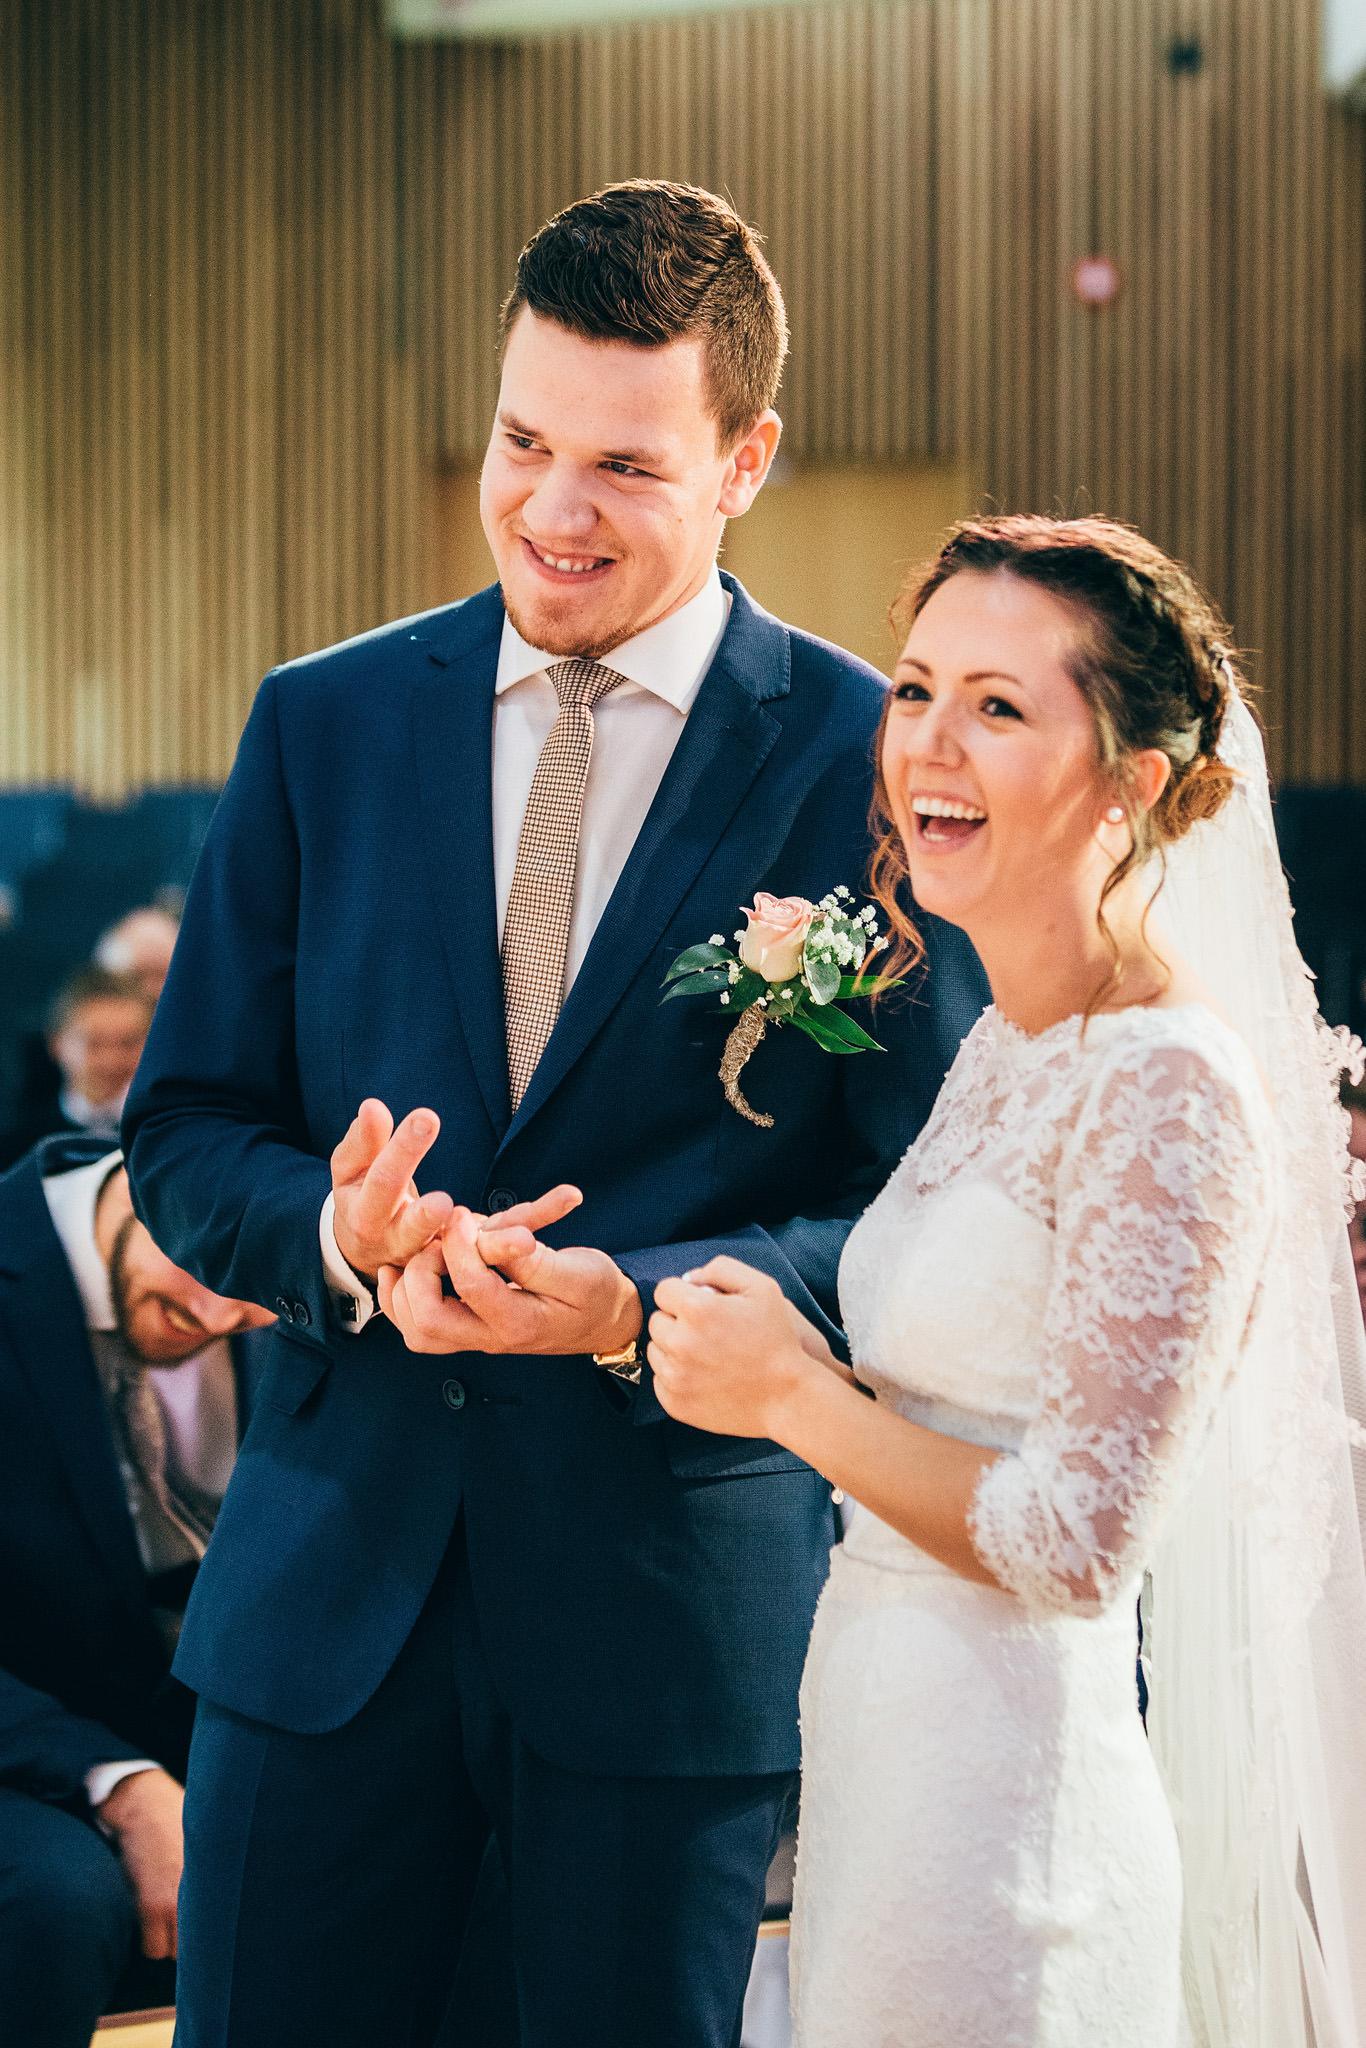 Norway+wedding+photographer+elopement+pre+wedding+Casey+Arneson-42.jpg